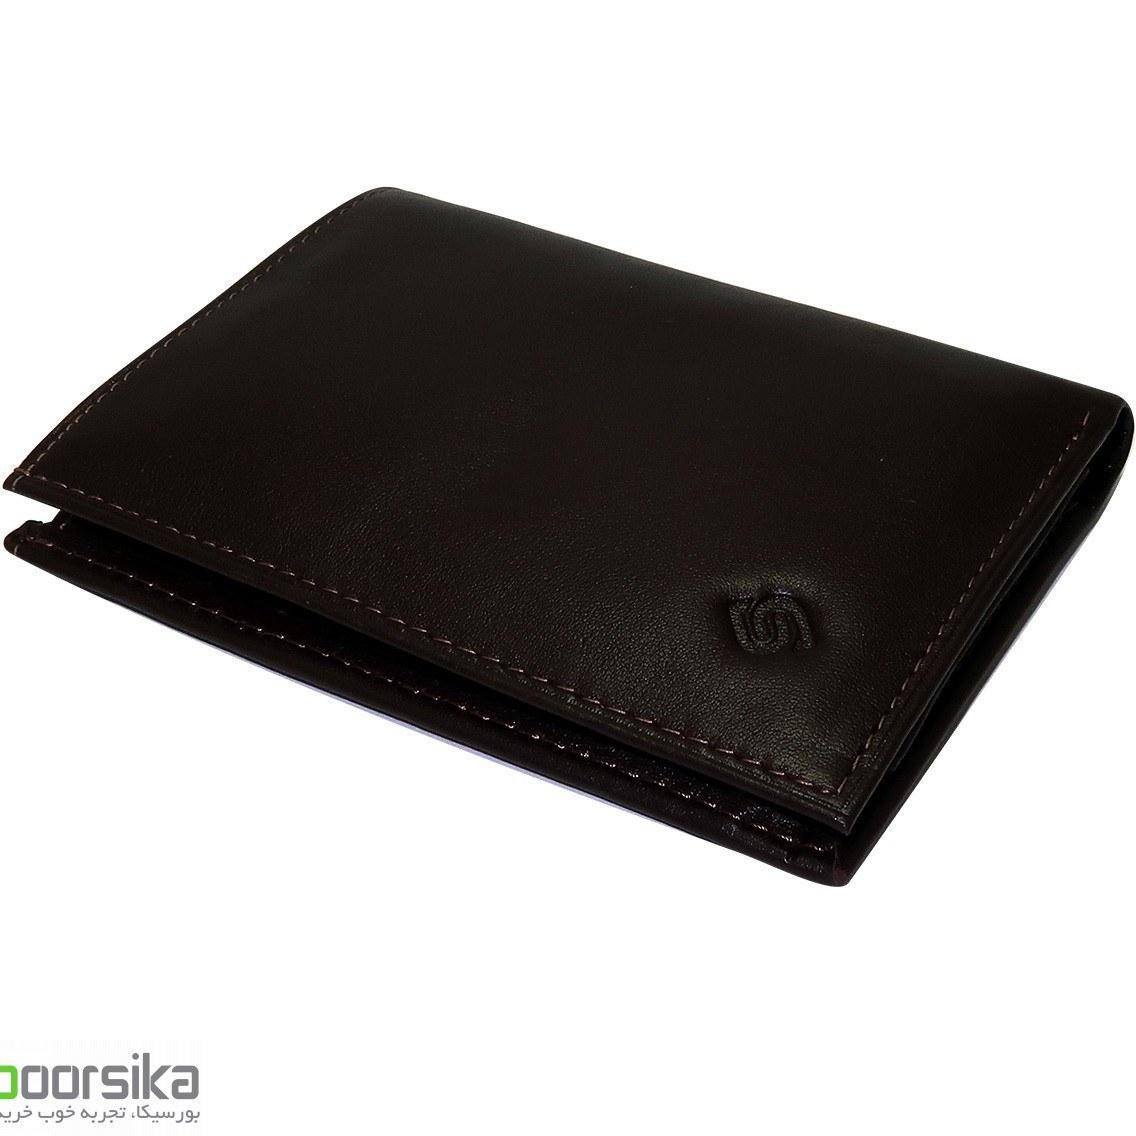 کیف پول کتابی چرم سورنا مدل SurenaWallet B1004